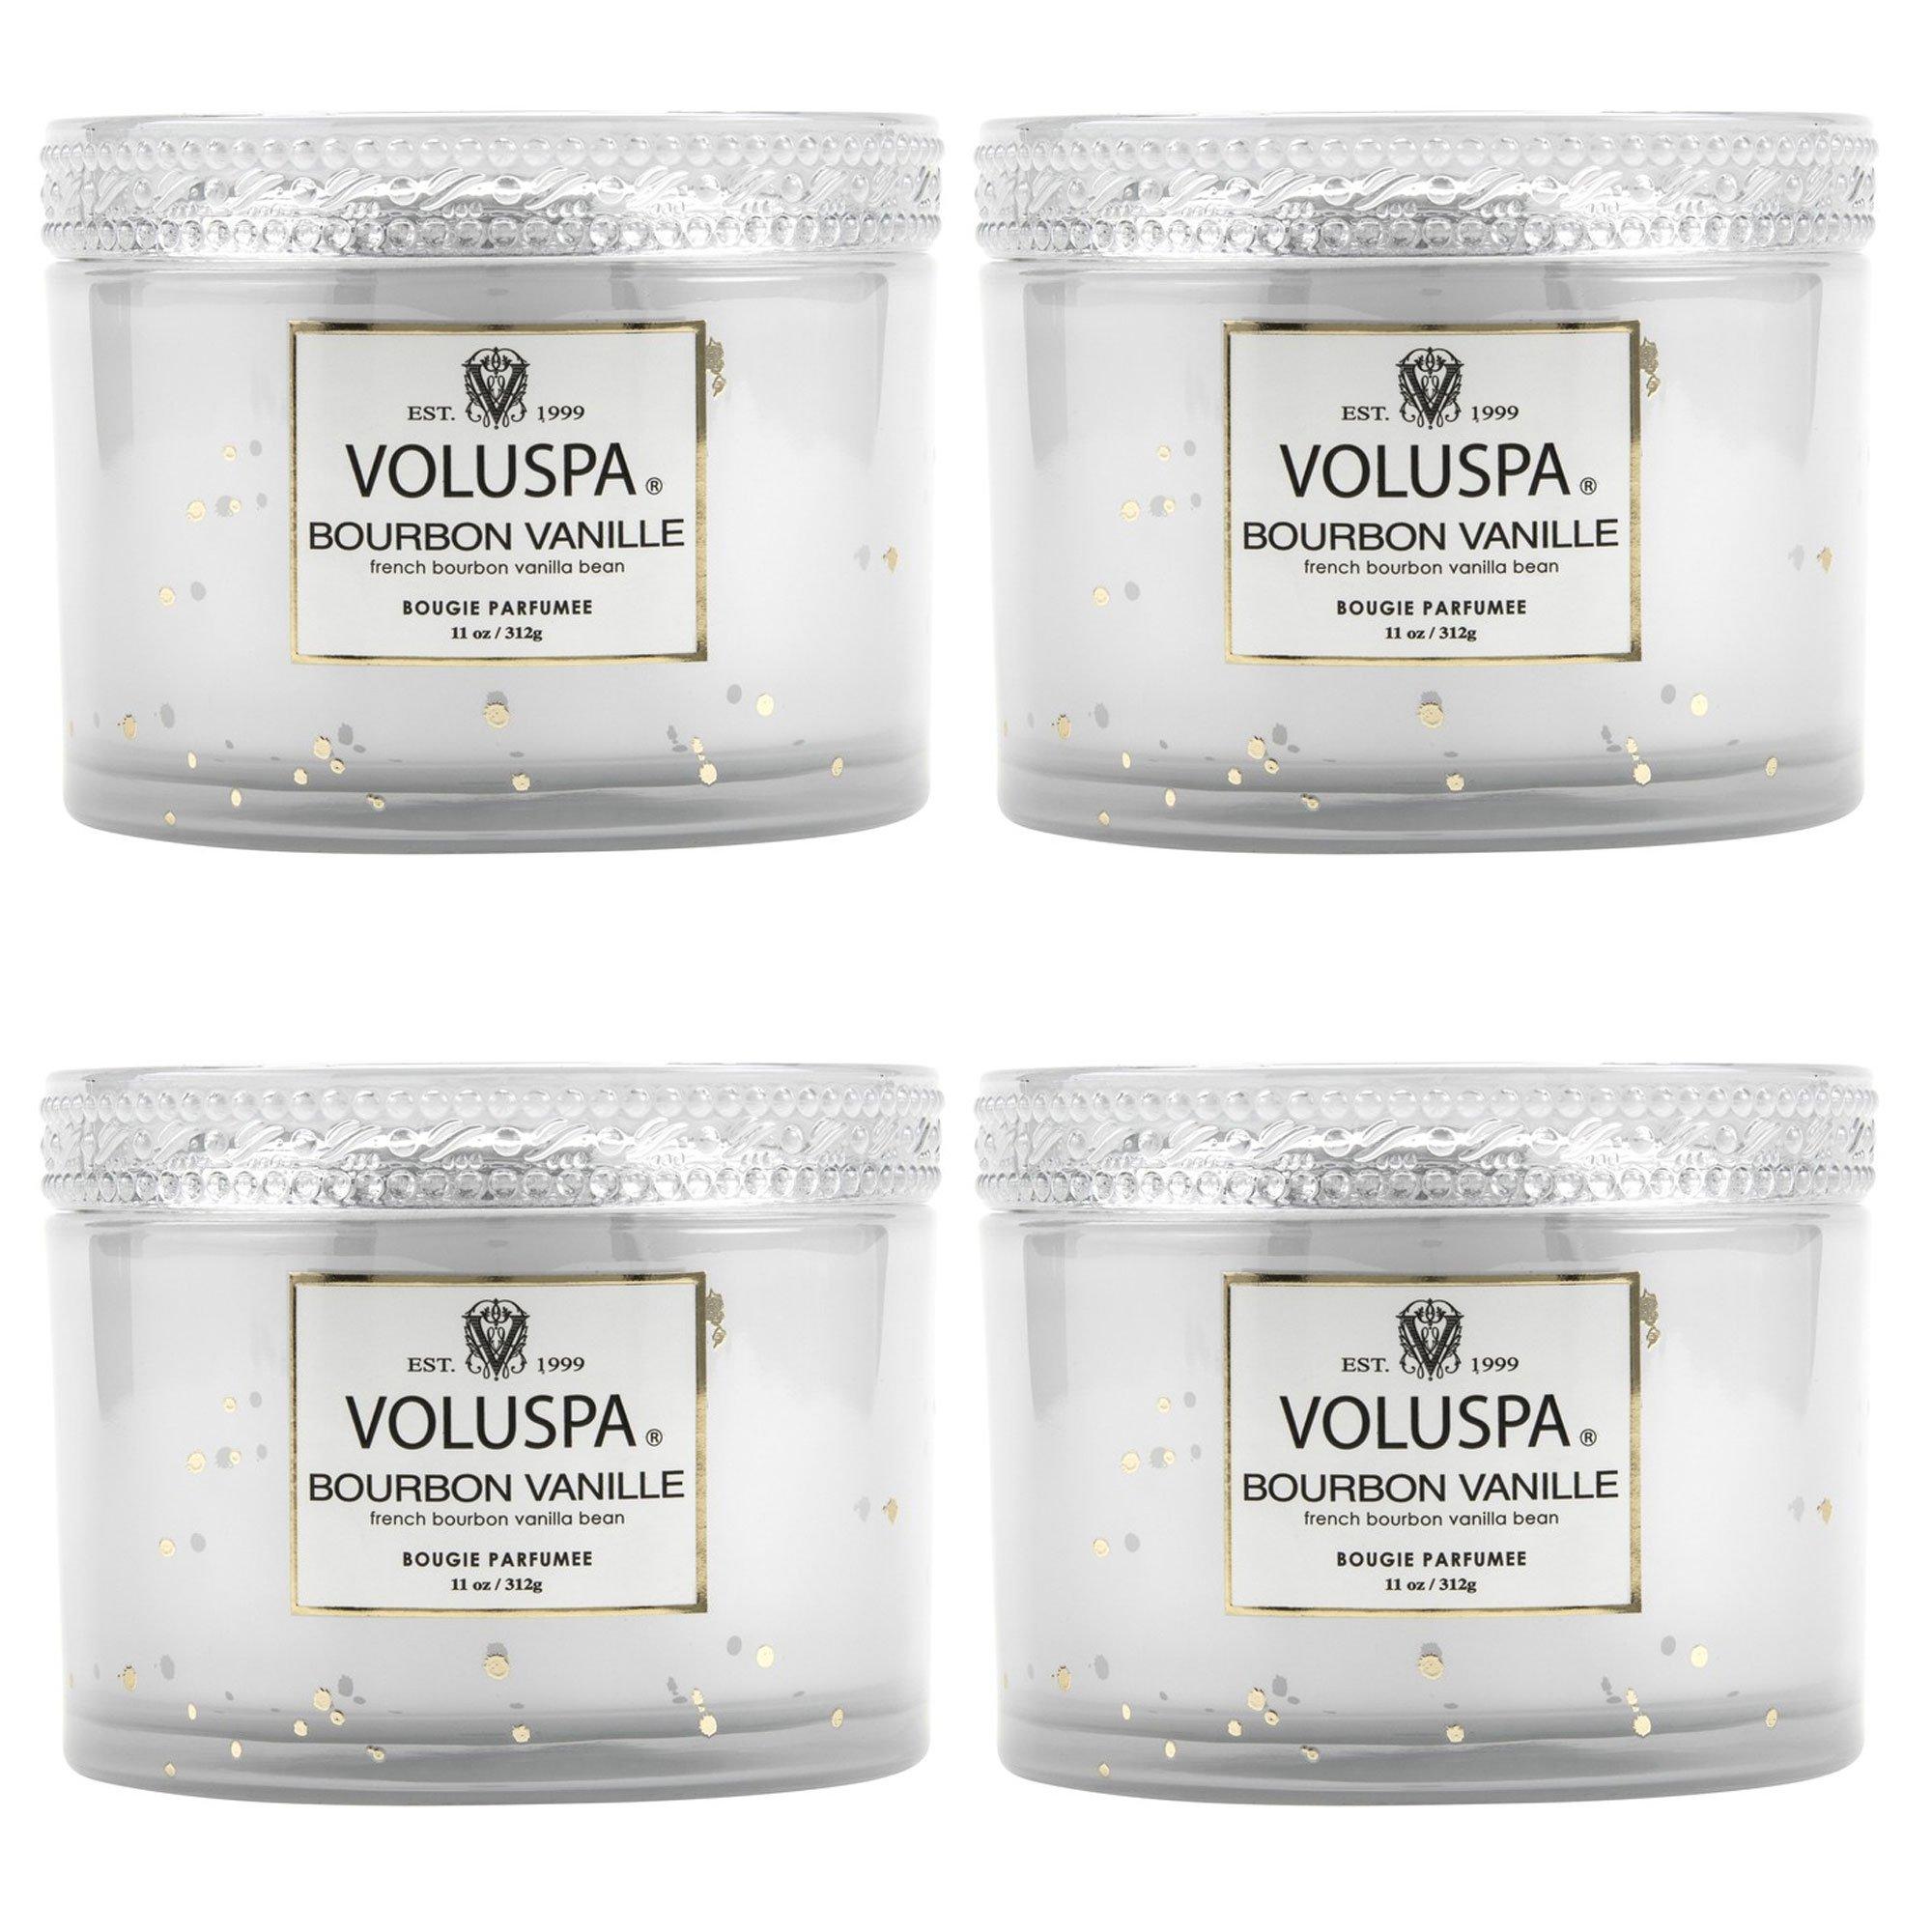 Voluspa Bourbon Vanille Corta Maison Candle 11 oz (4 pack) by Voluspa